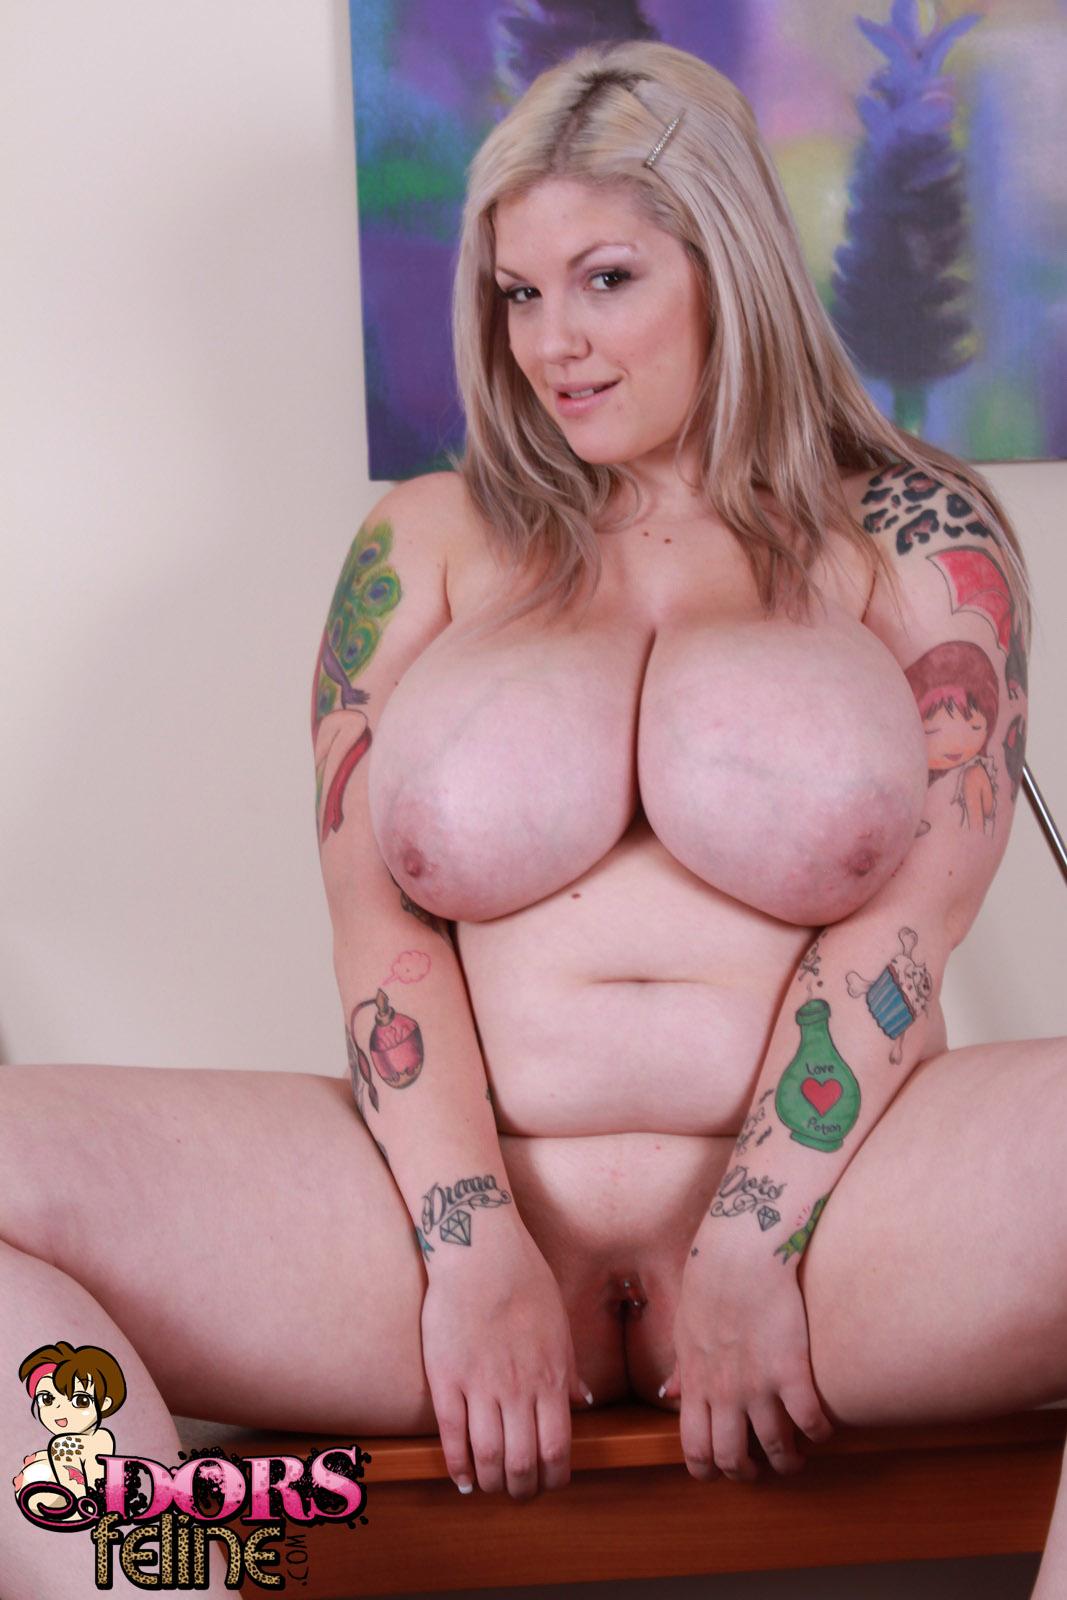 Dors Feline Nude